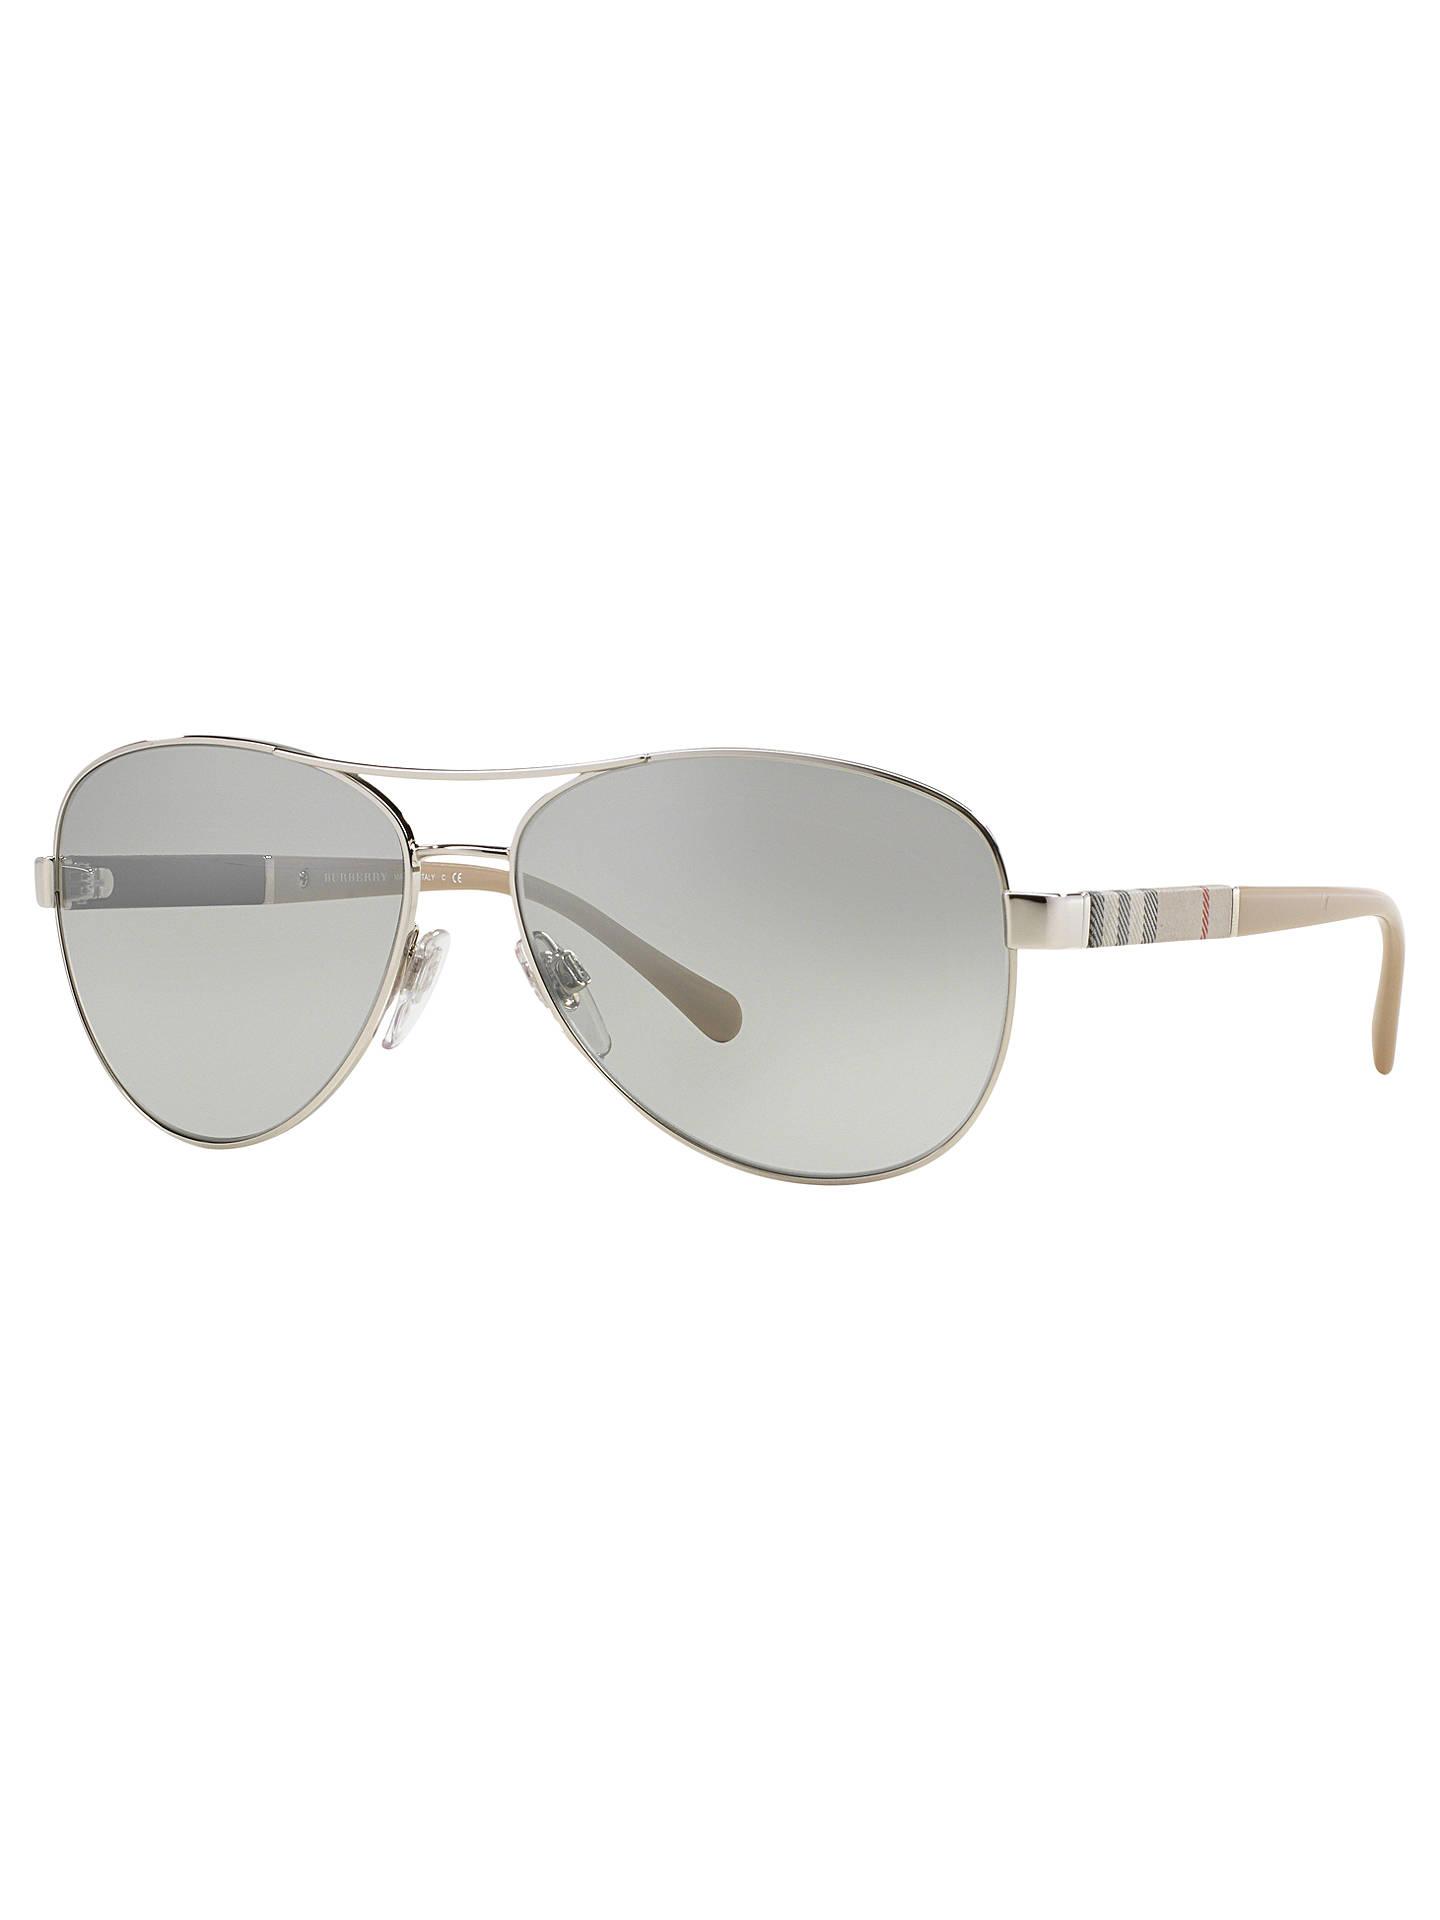 c47da9f309f Buy Burberry BE3080 Pilot Sunglasses